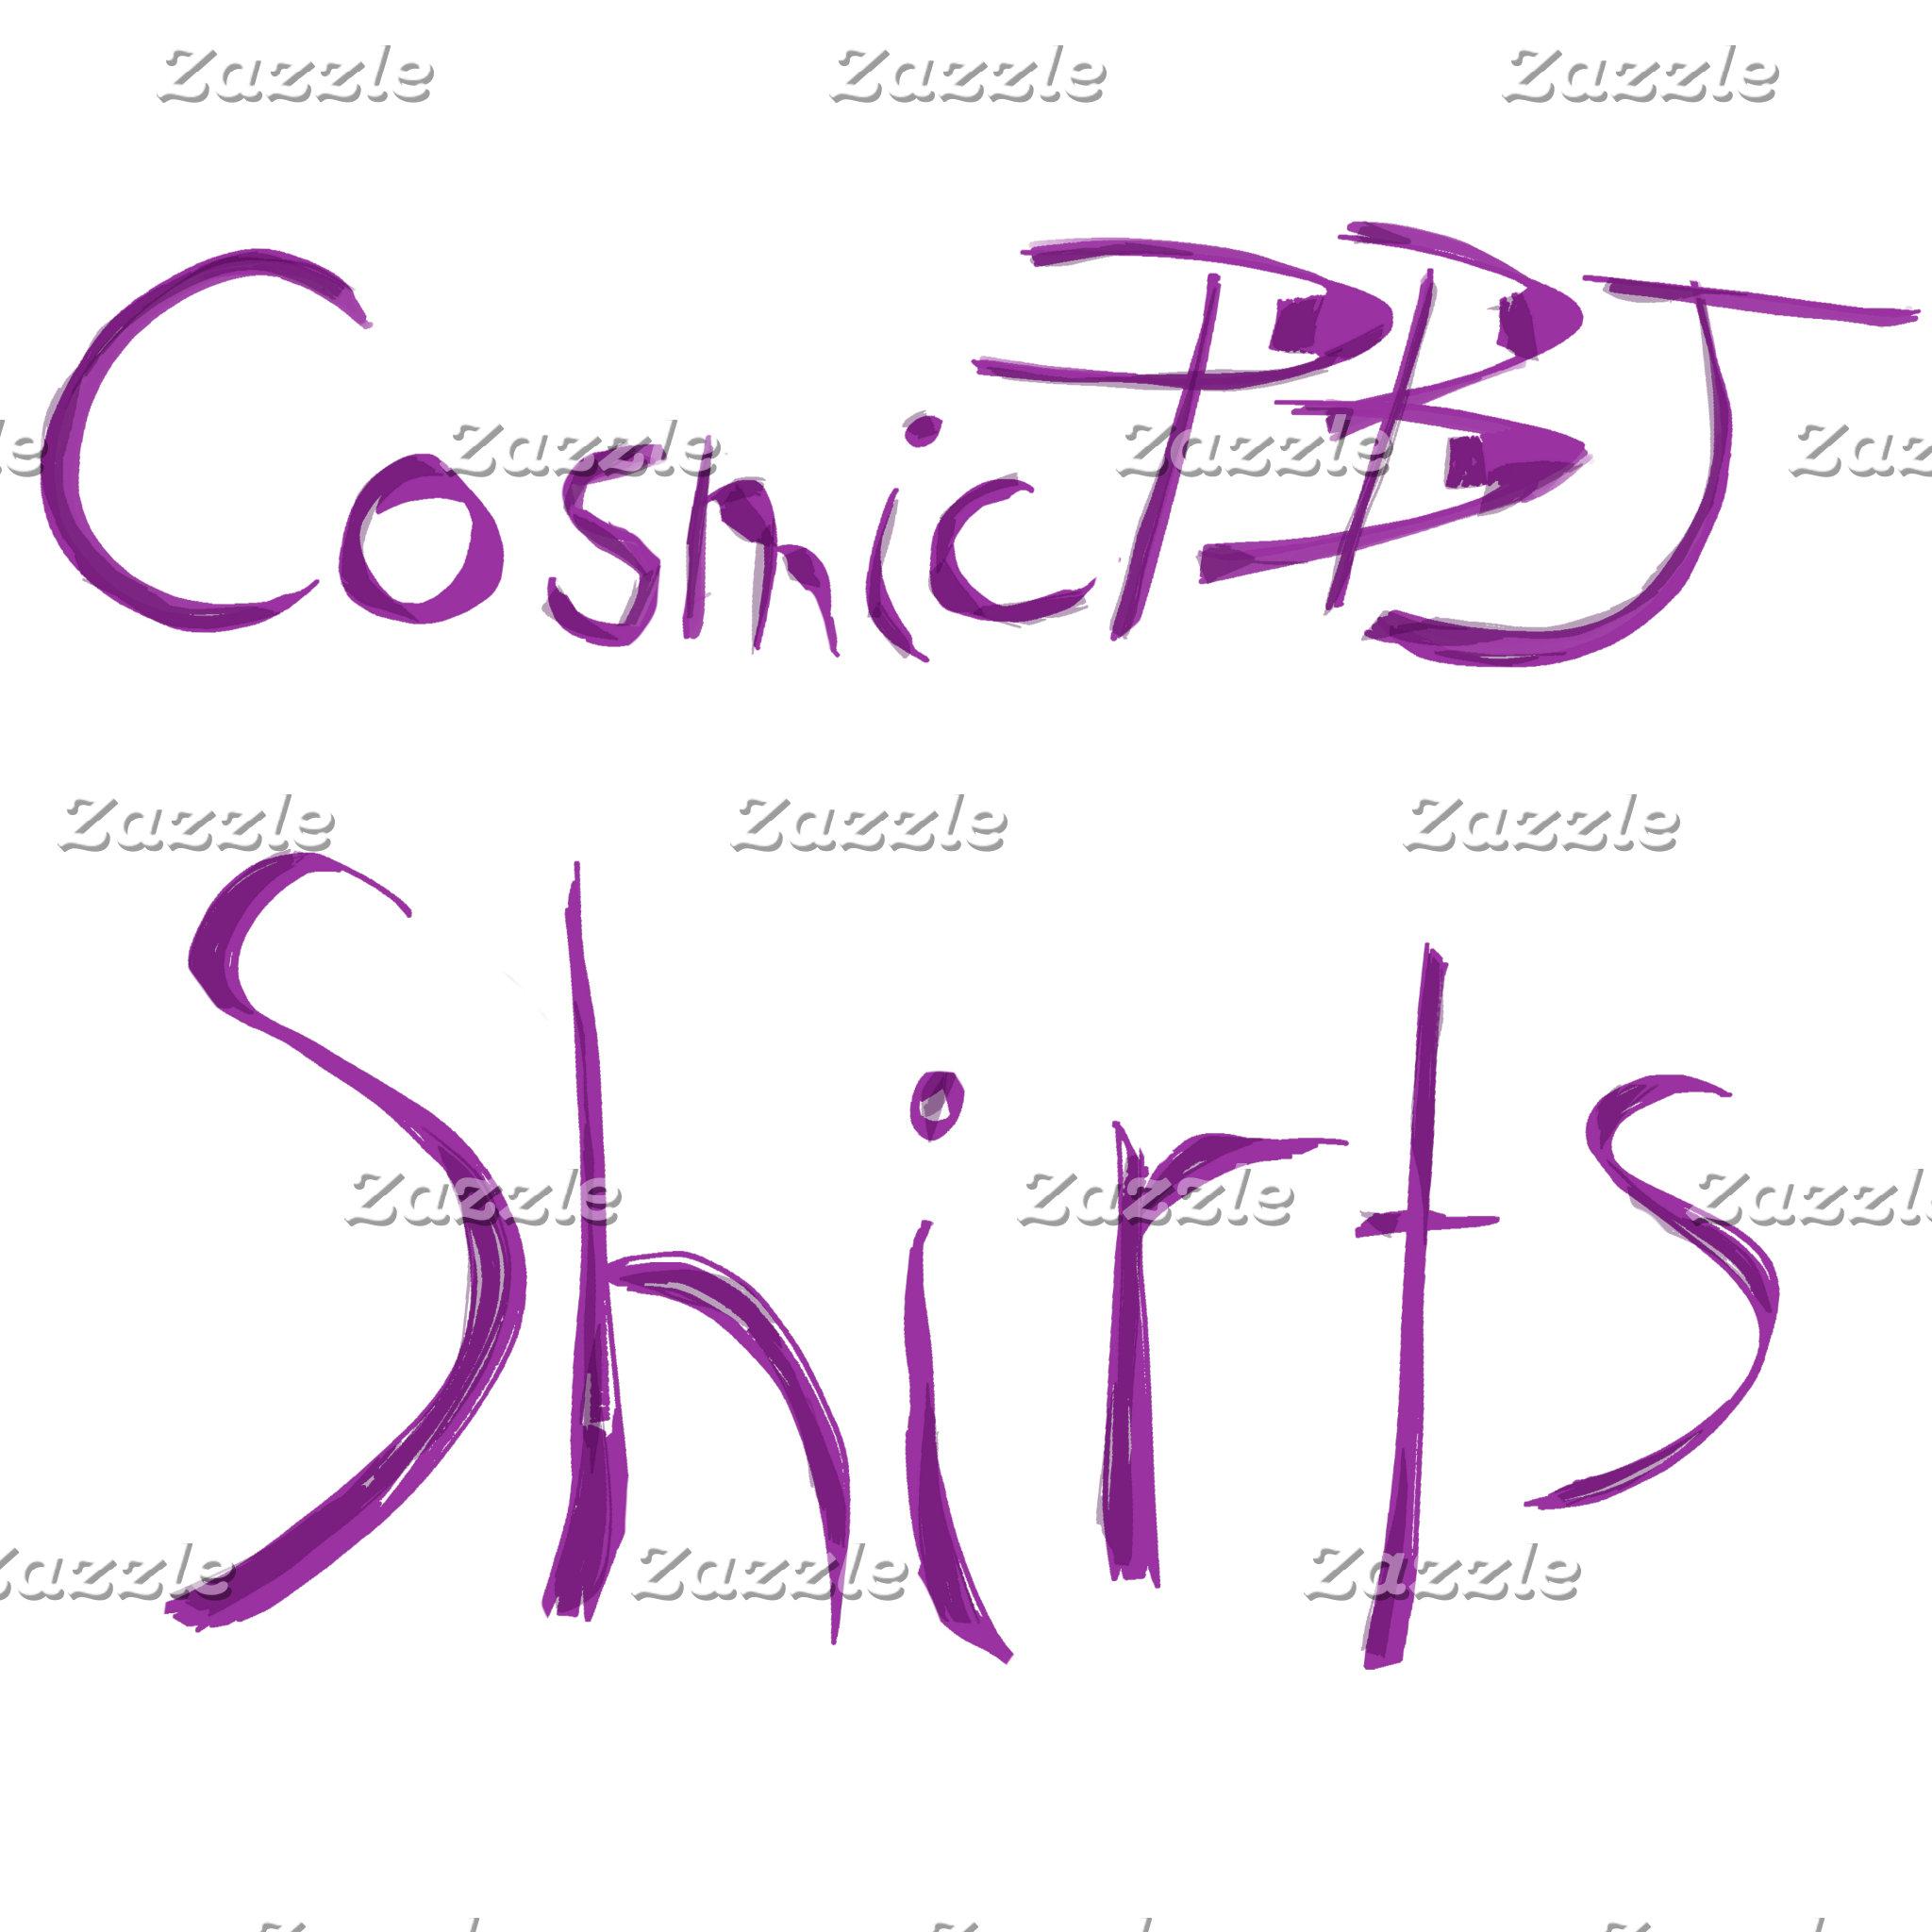 Shirts!